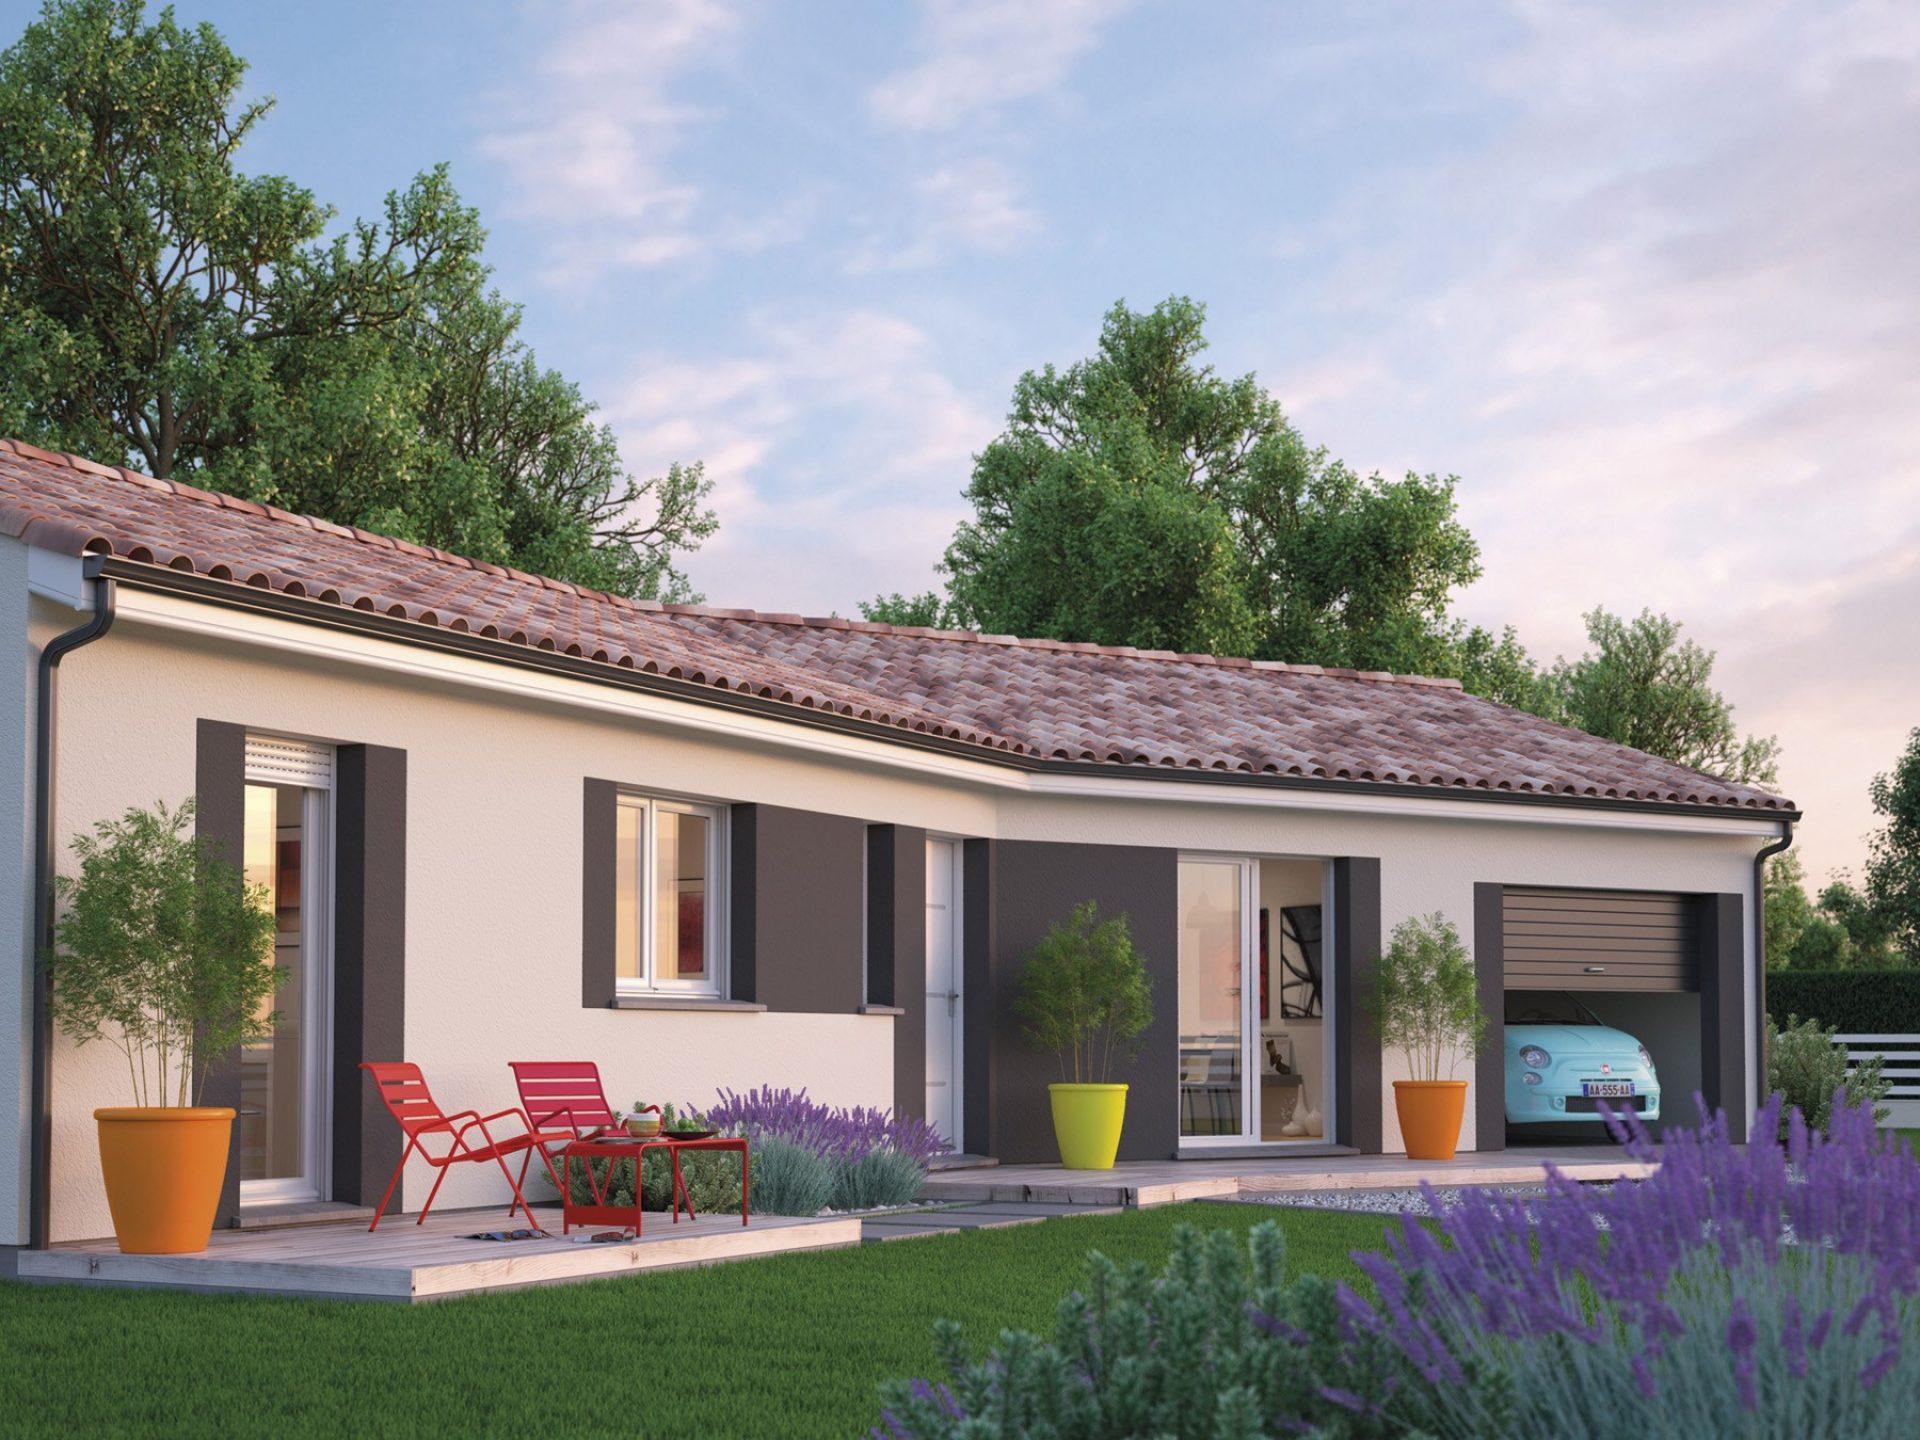 La maison Garonne   69 à 107 m²   2 ou 3 chambres